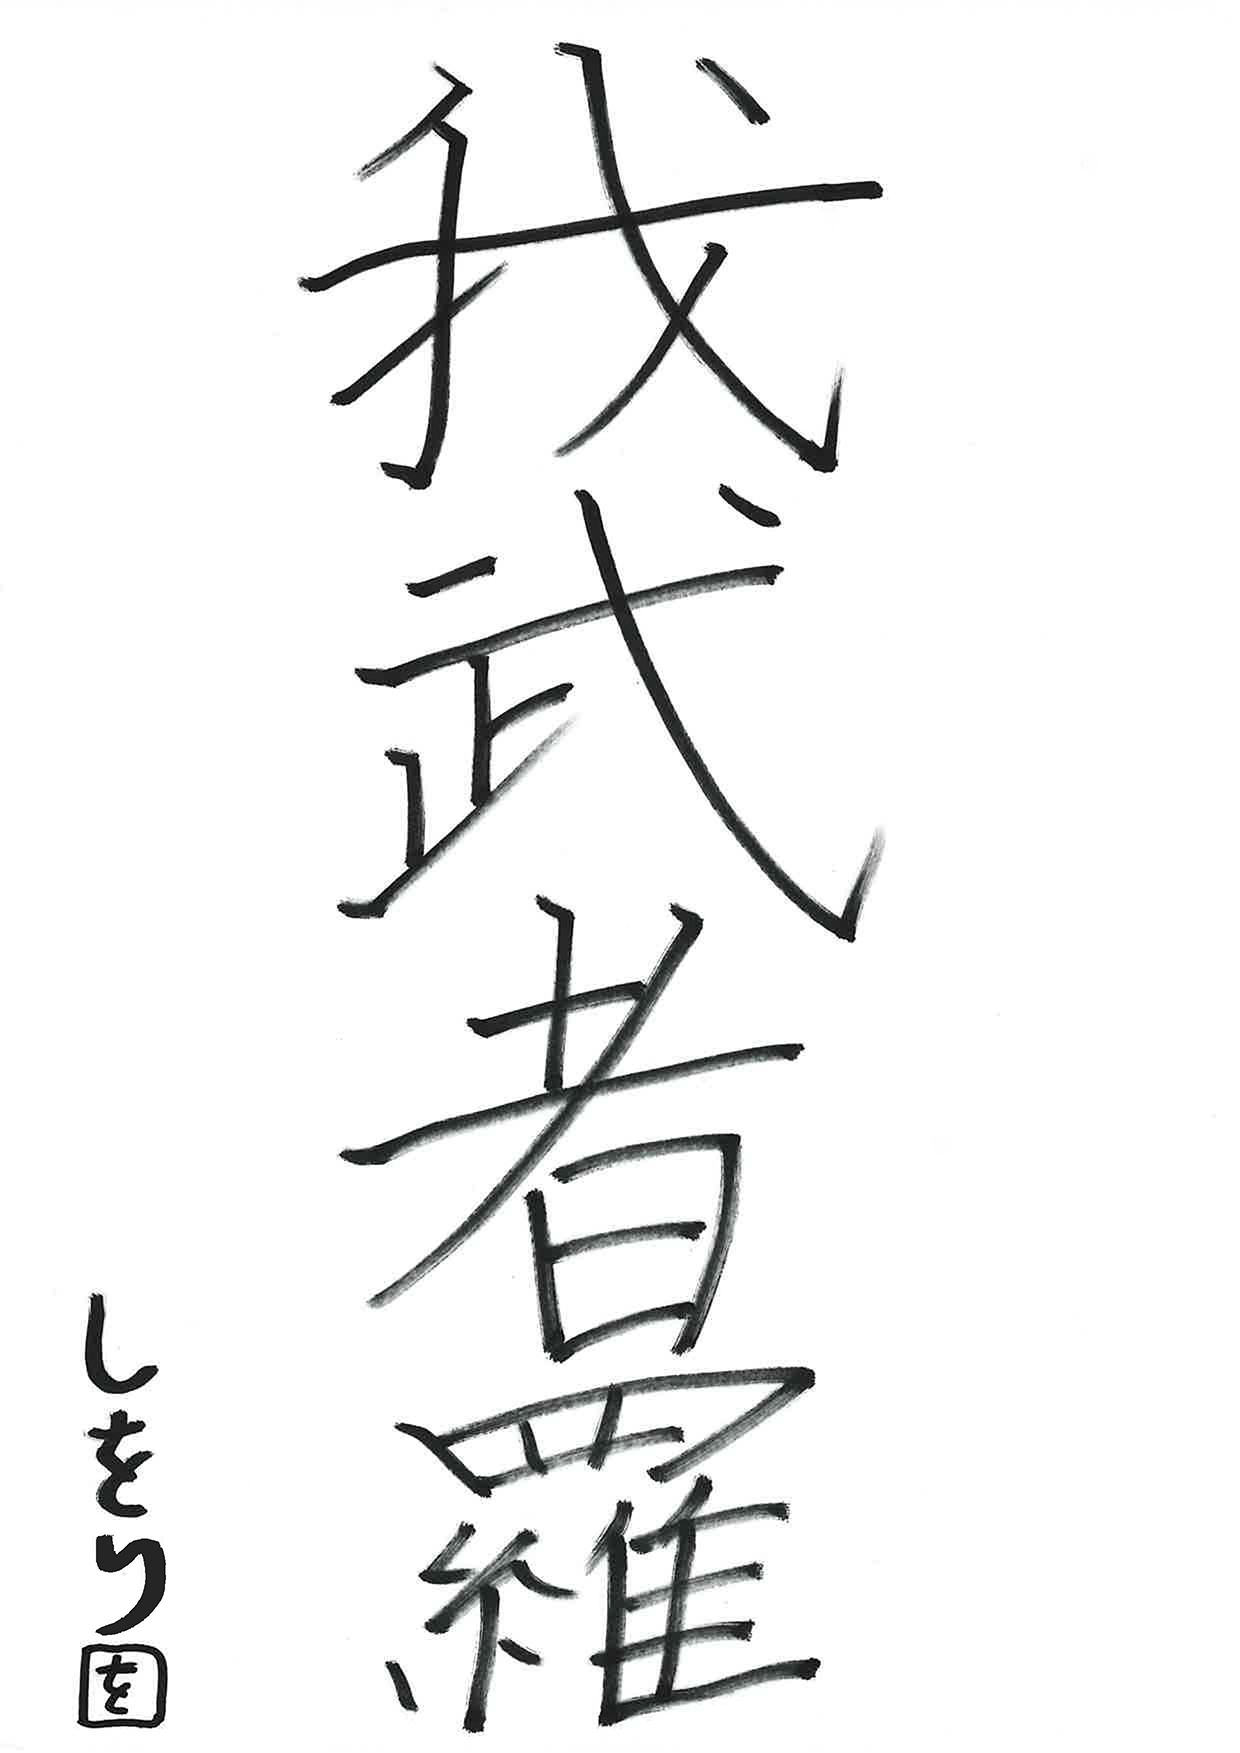 【欅坂46】佐藤詩織応援スレ★8【美術】YouTube動画>52本 ->画像>235枚